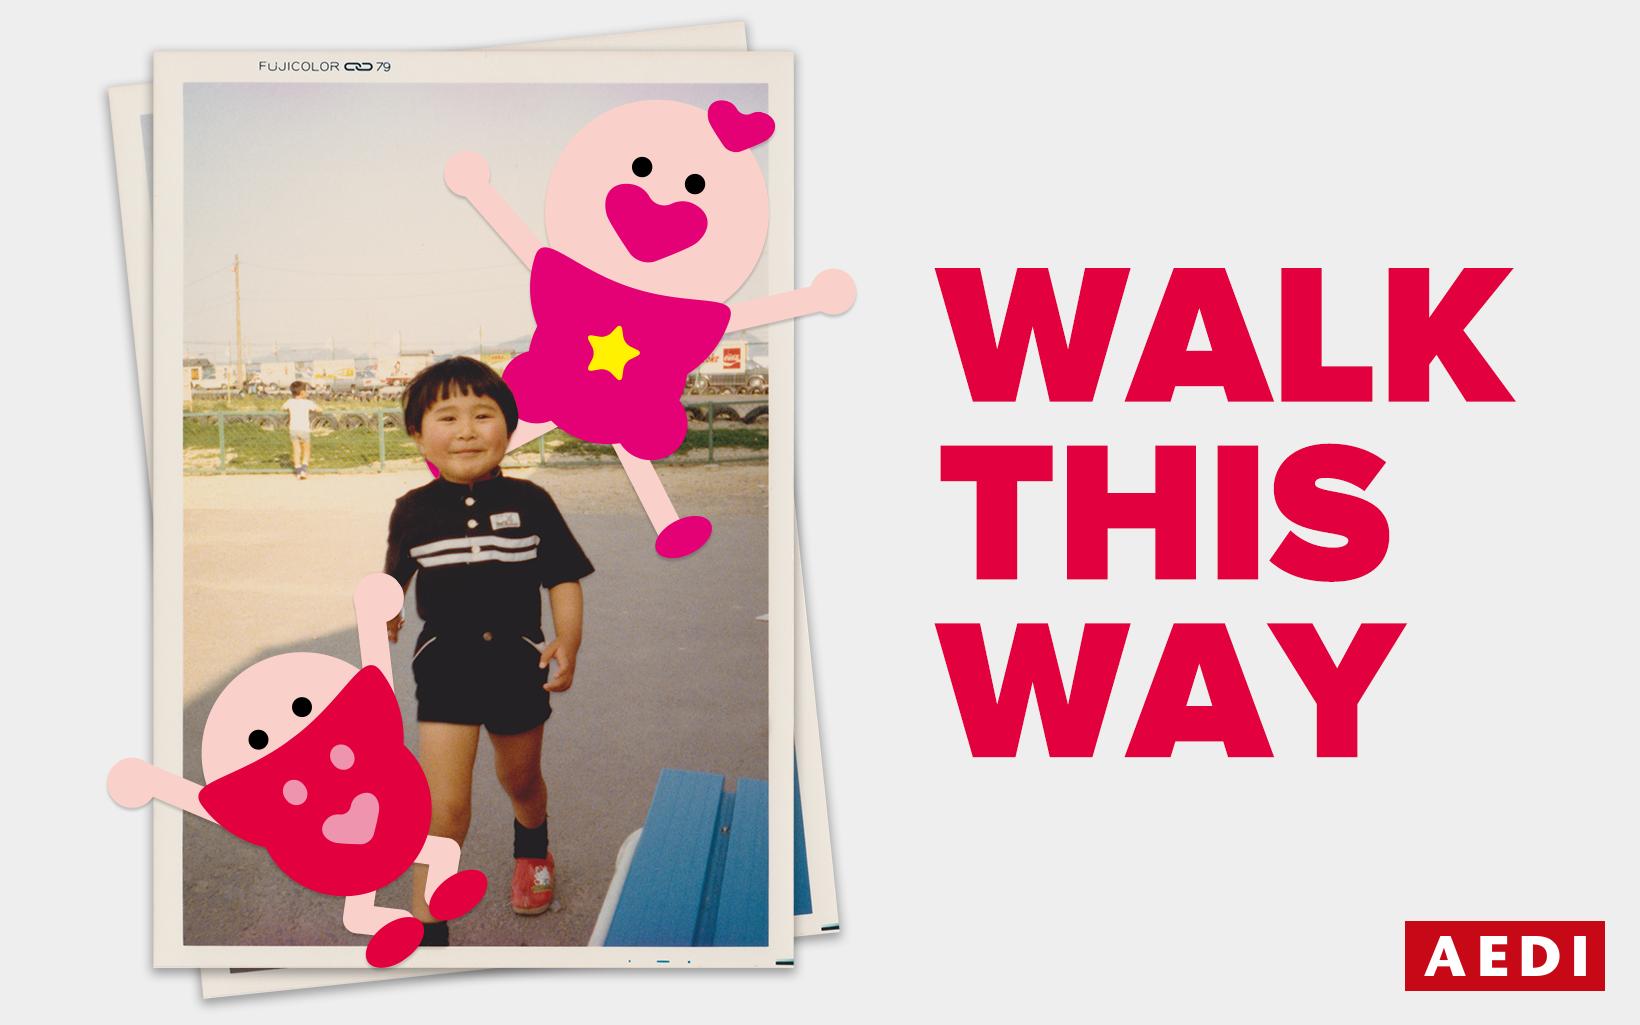 WALK THIS WAY 岡山県倉敷市のWebとデザインの制作会社 AEDI 良いデザイン、Webサイト・ホームページを作り続ける